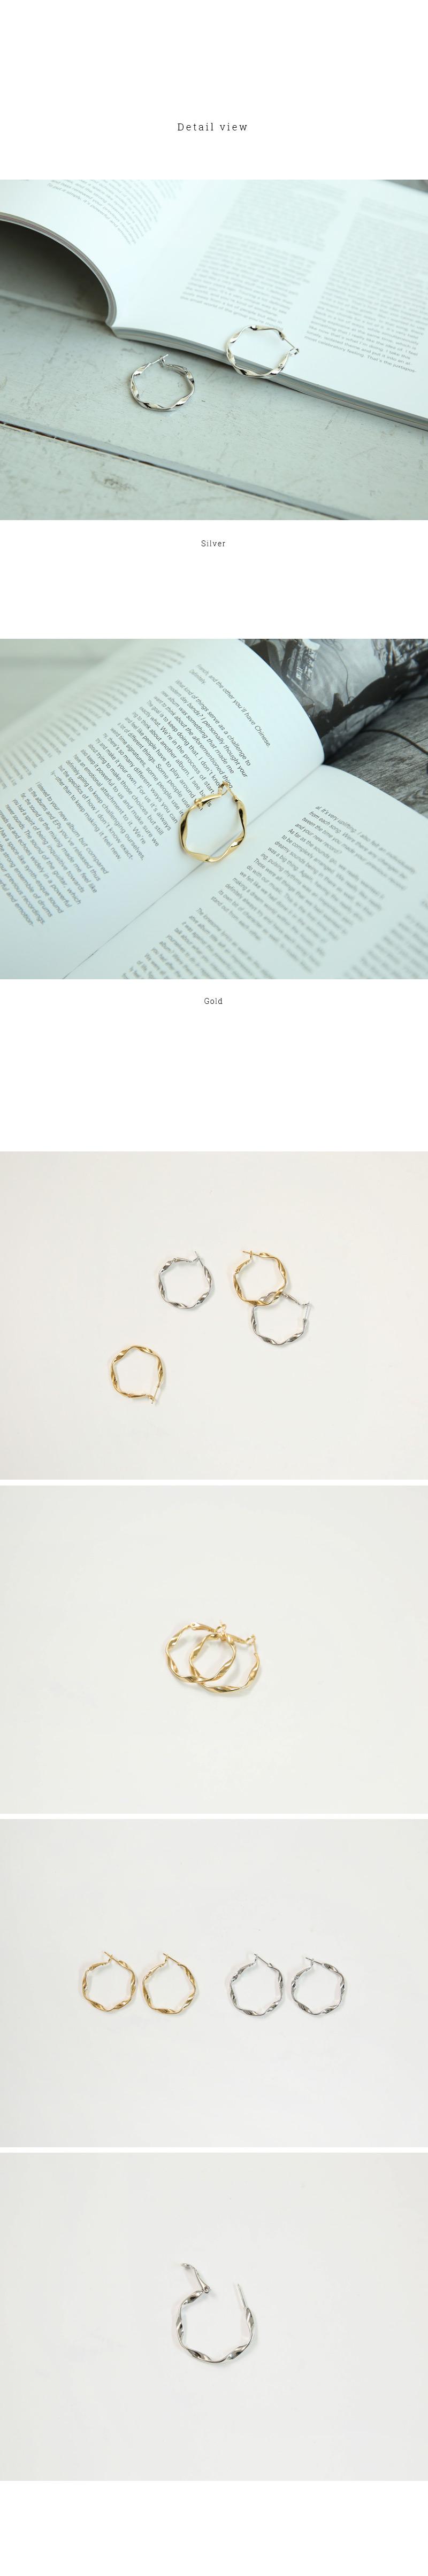 Mood earrings